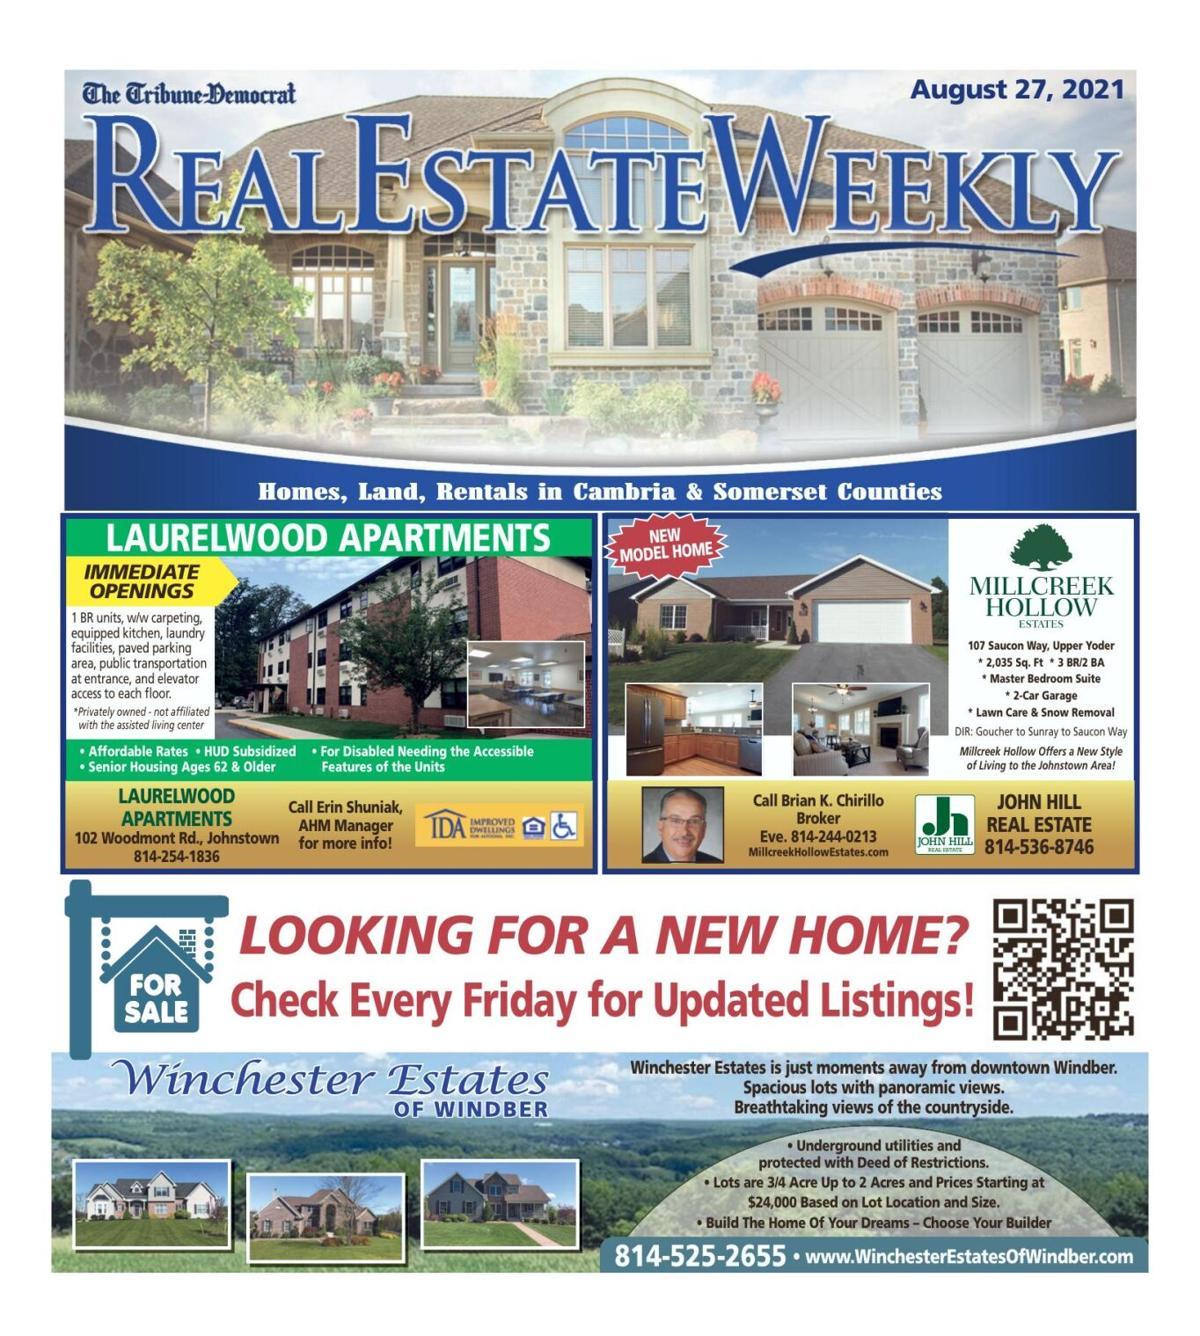 Real Estate Weekly August 27, 2021